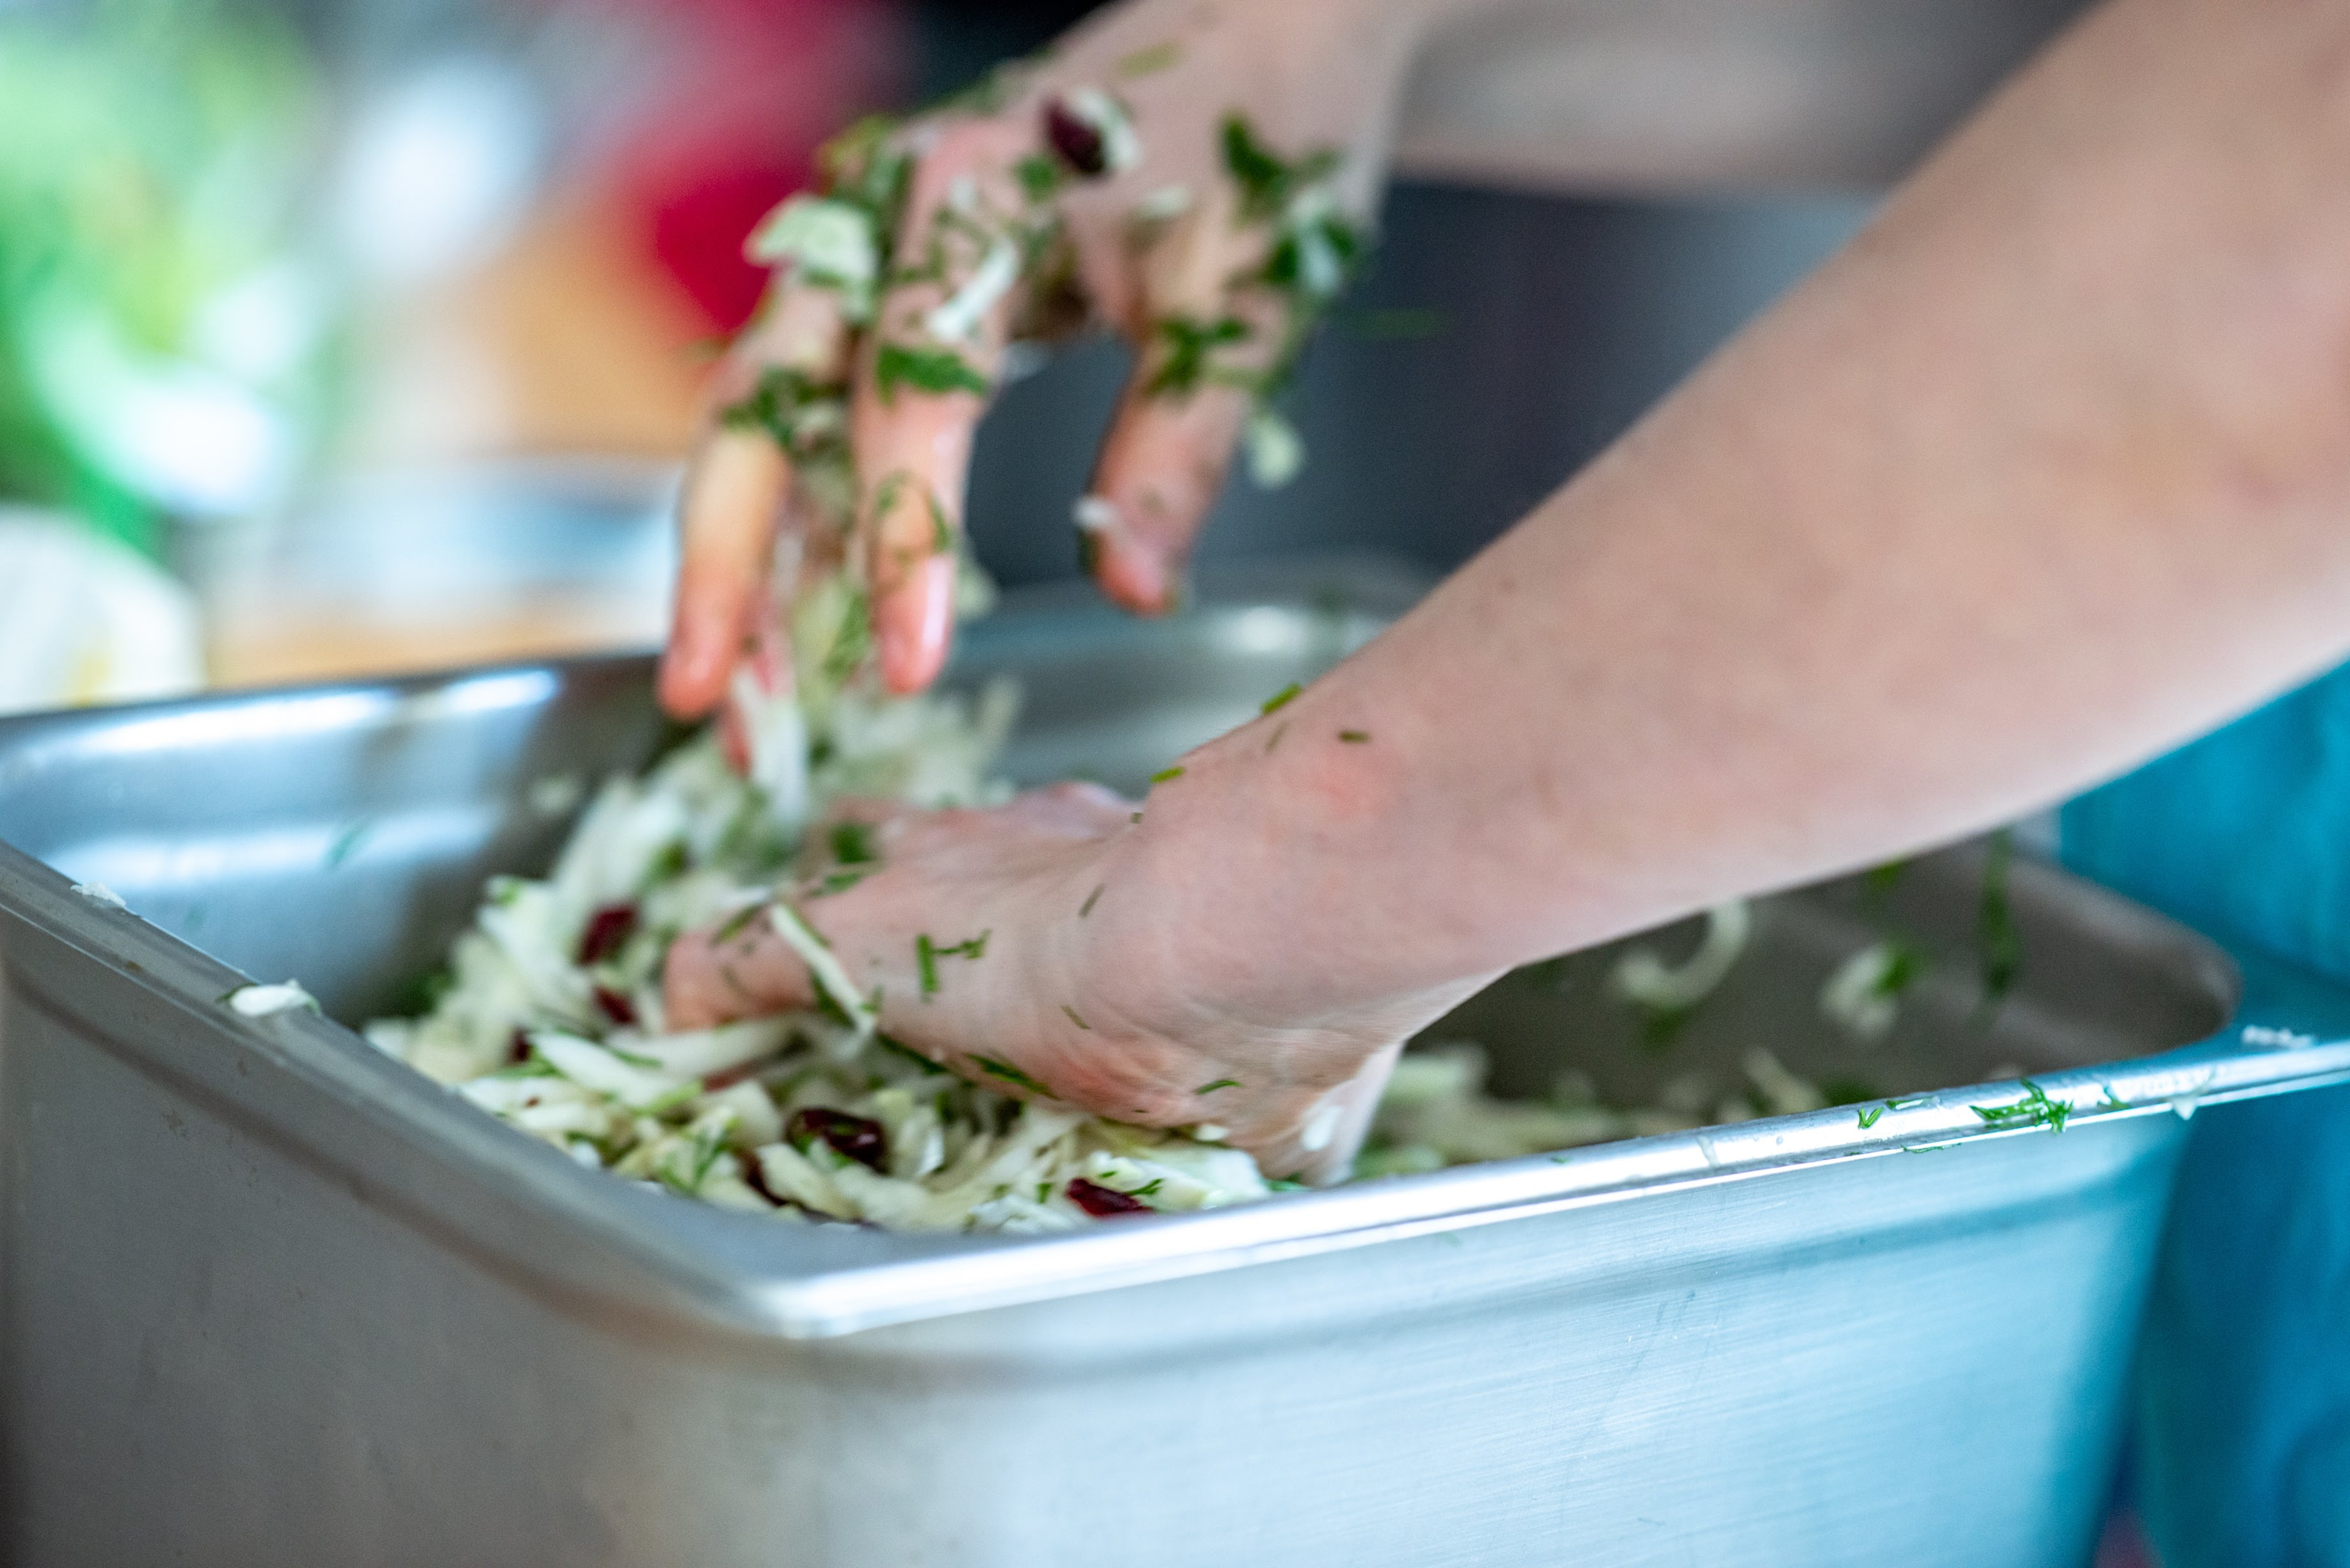 salade prepareren